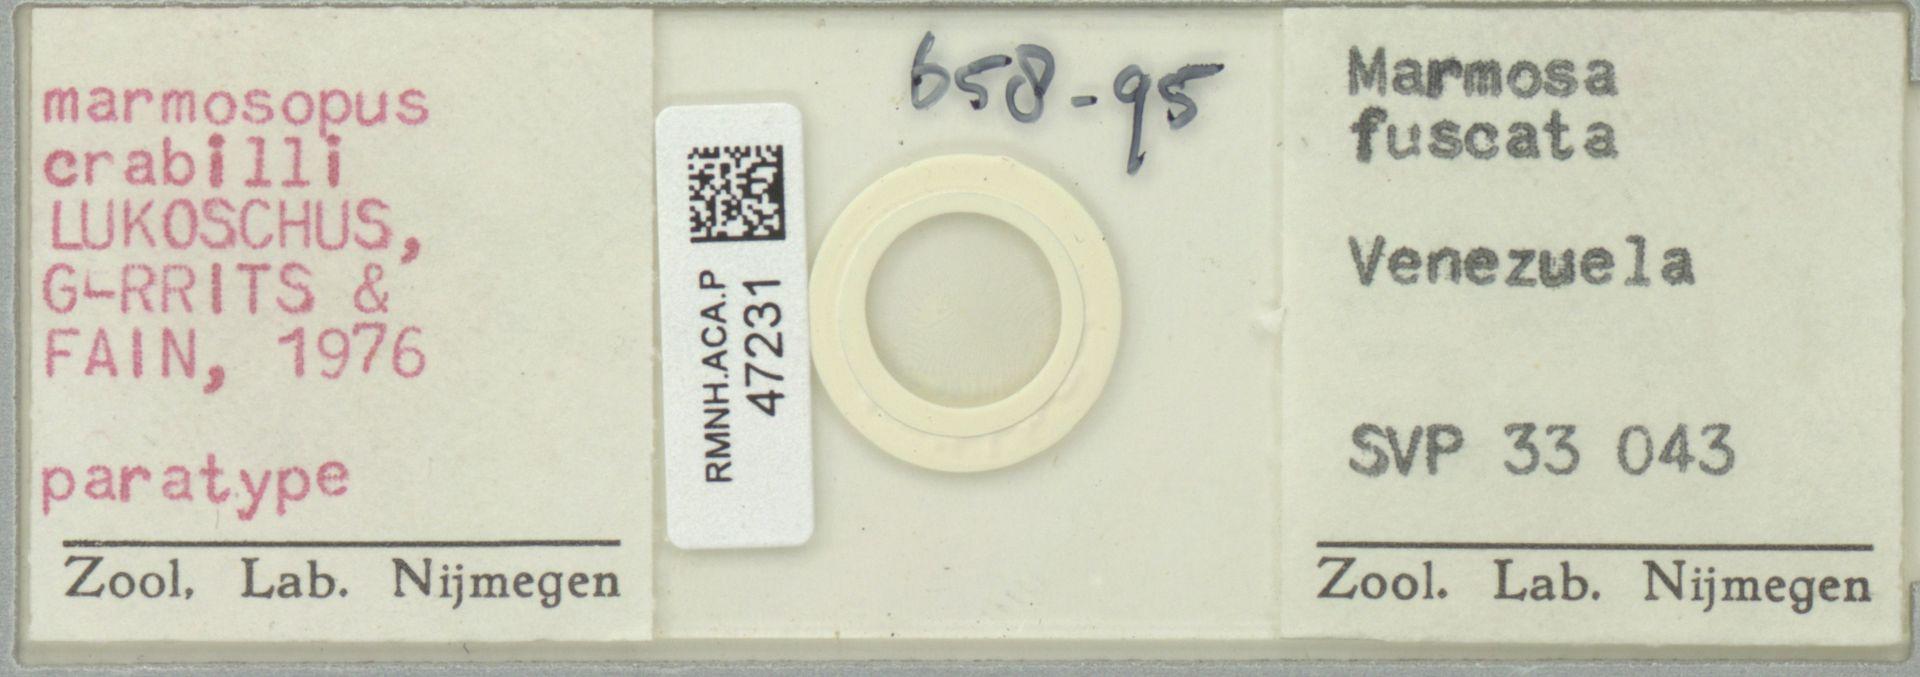 RMNH.ACA.P.47231 | Marmosopus crabilli Lukoschus, Gerrits, Fain 1976